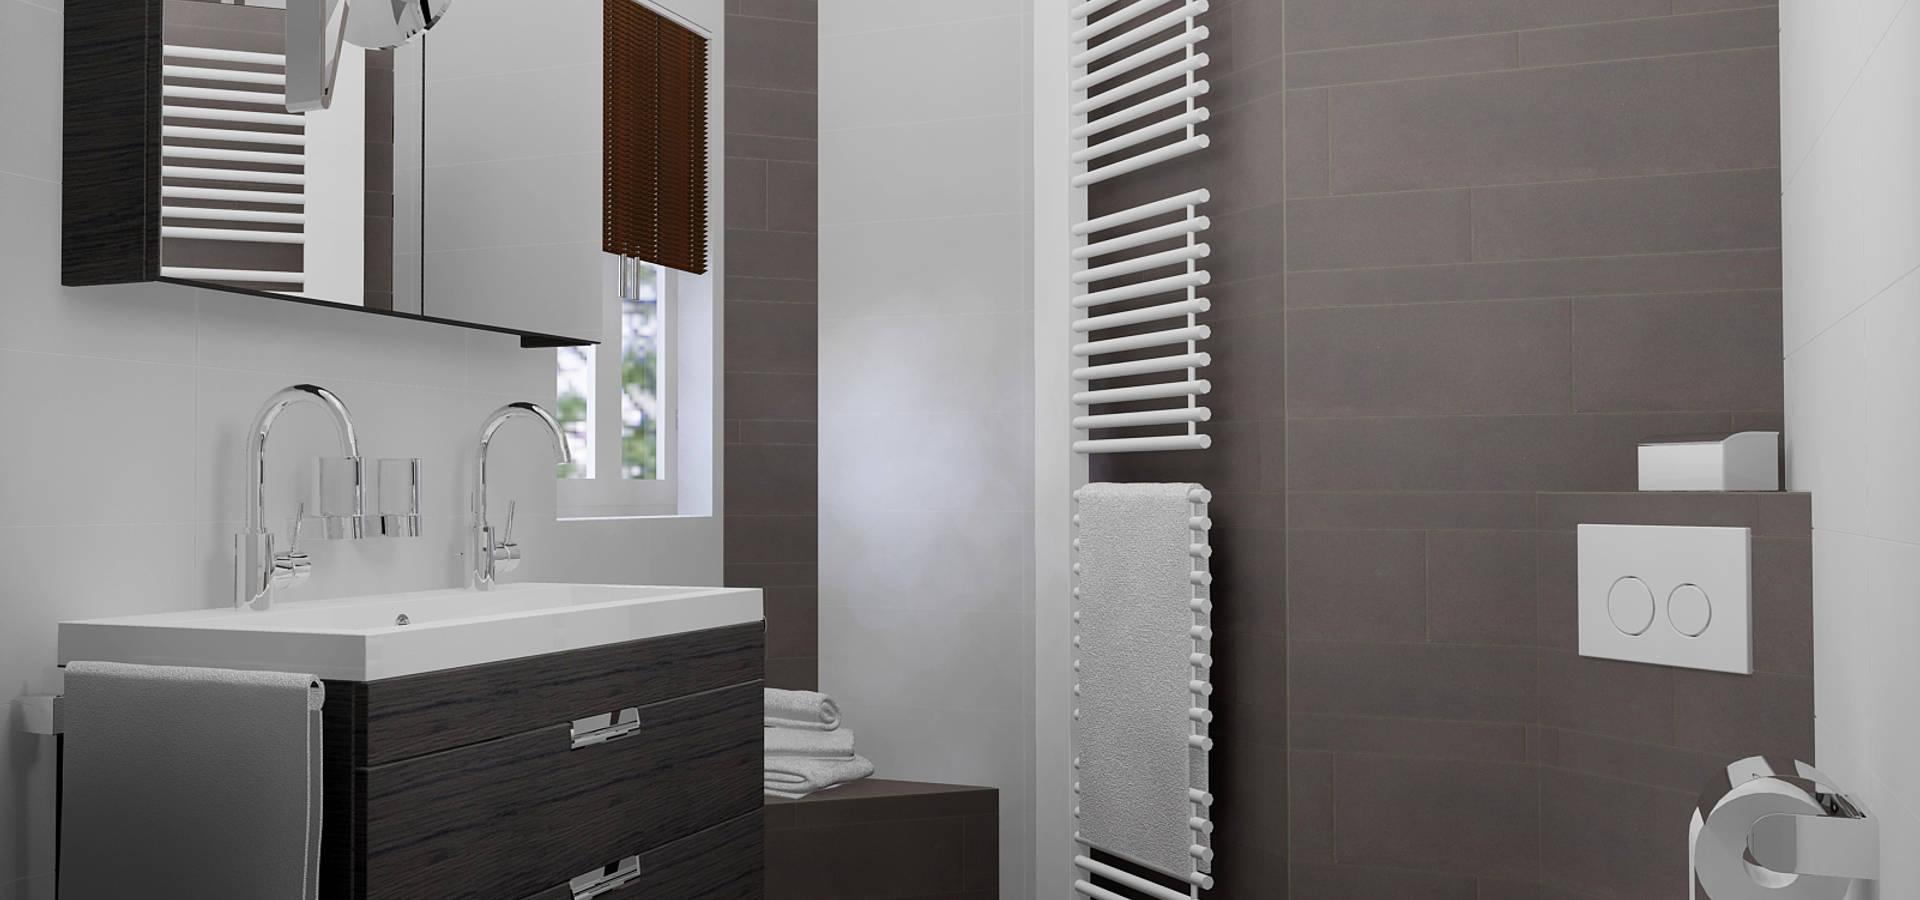 Kleine badkamer ontwerpen by Sani-bouw   homify